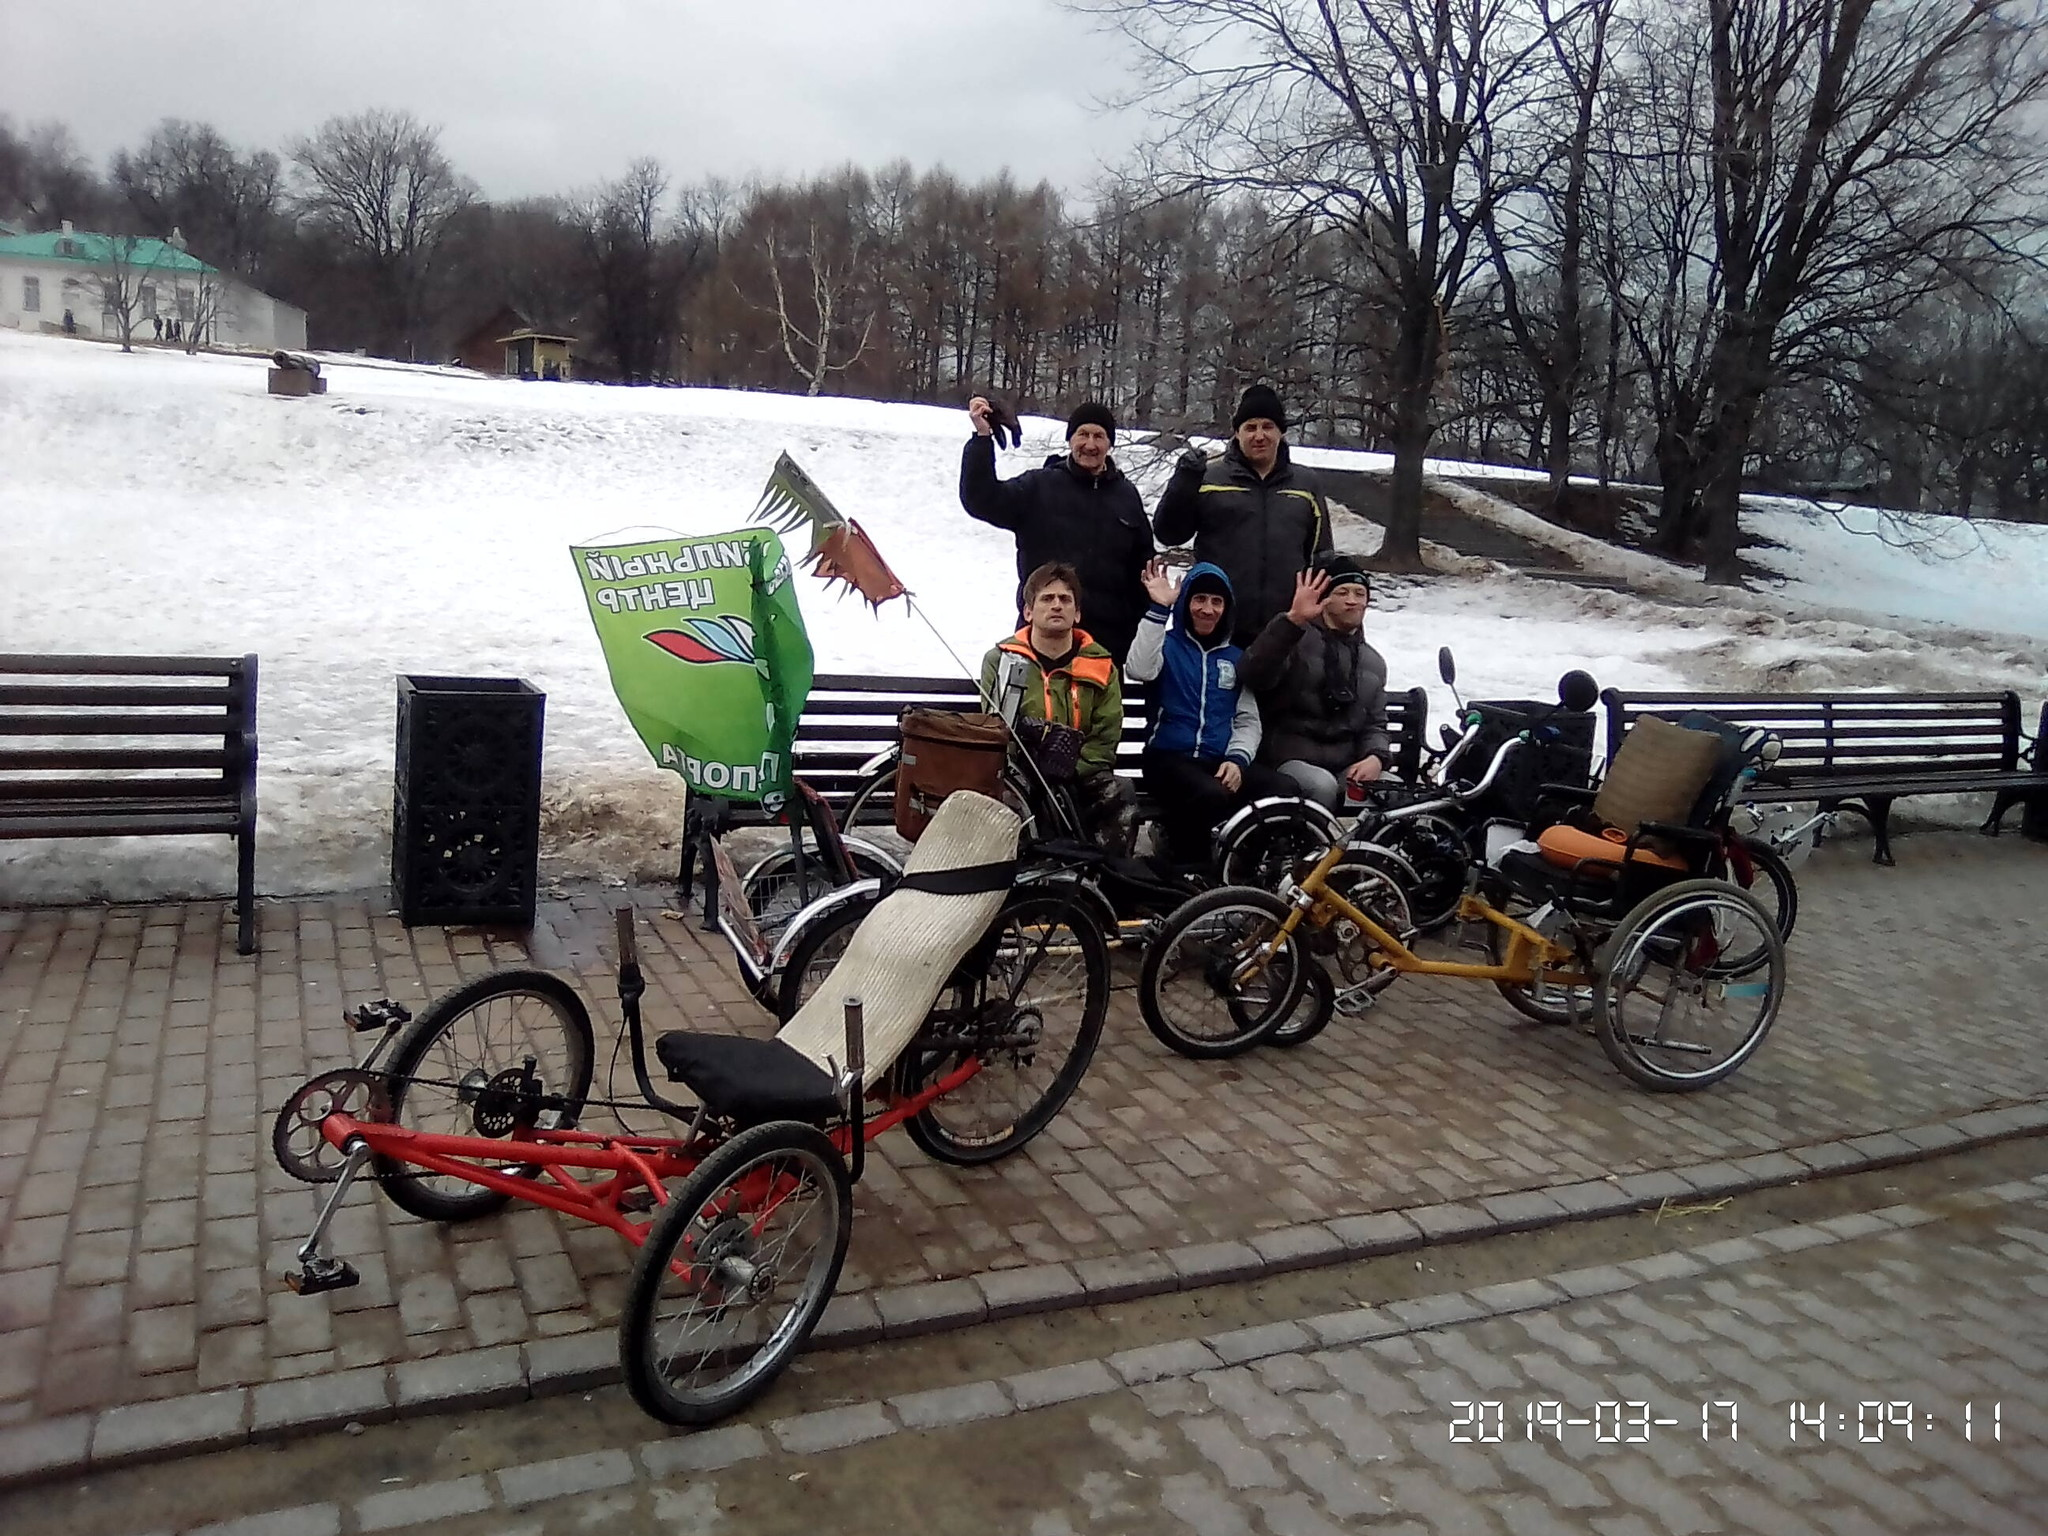 https://content.foto.my.mail.ru/list/maxnev/syzdalchev/h-317.jpg